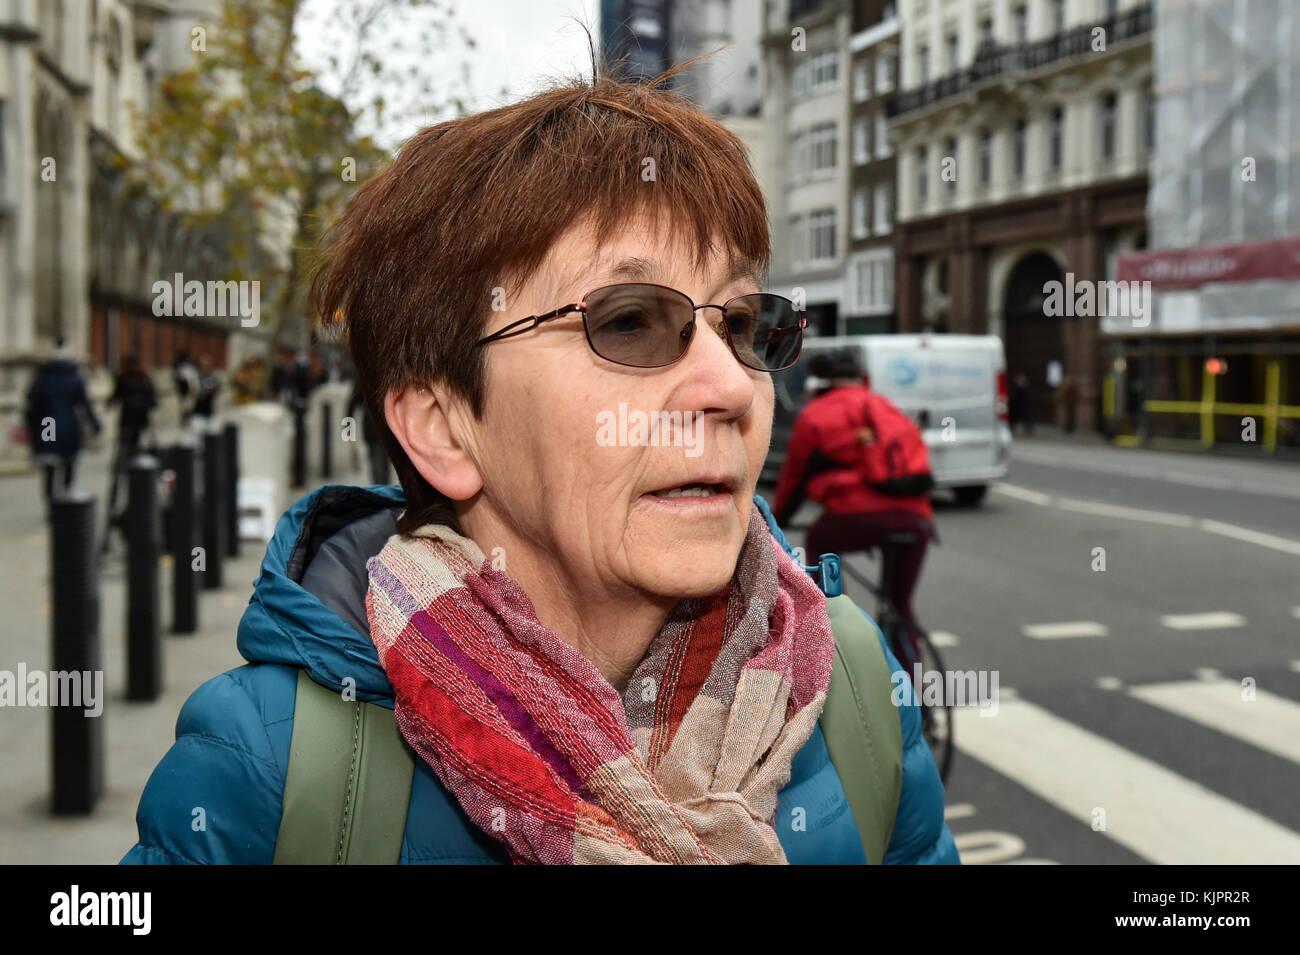 London, United Kingdom. 29 November 2017. Sirkka-Liisa Love talks to the press as her son Lauri Love arrives at - Stock Image